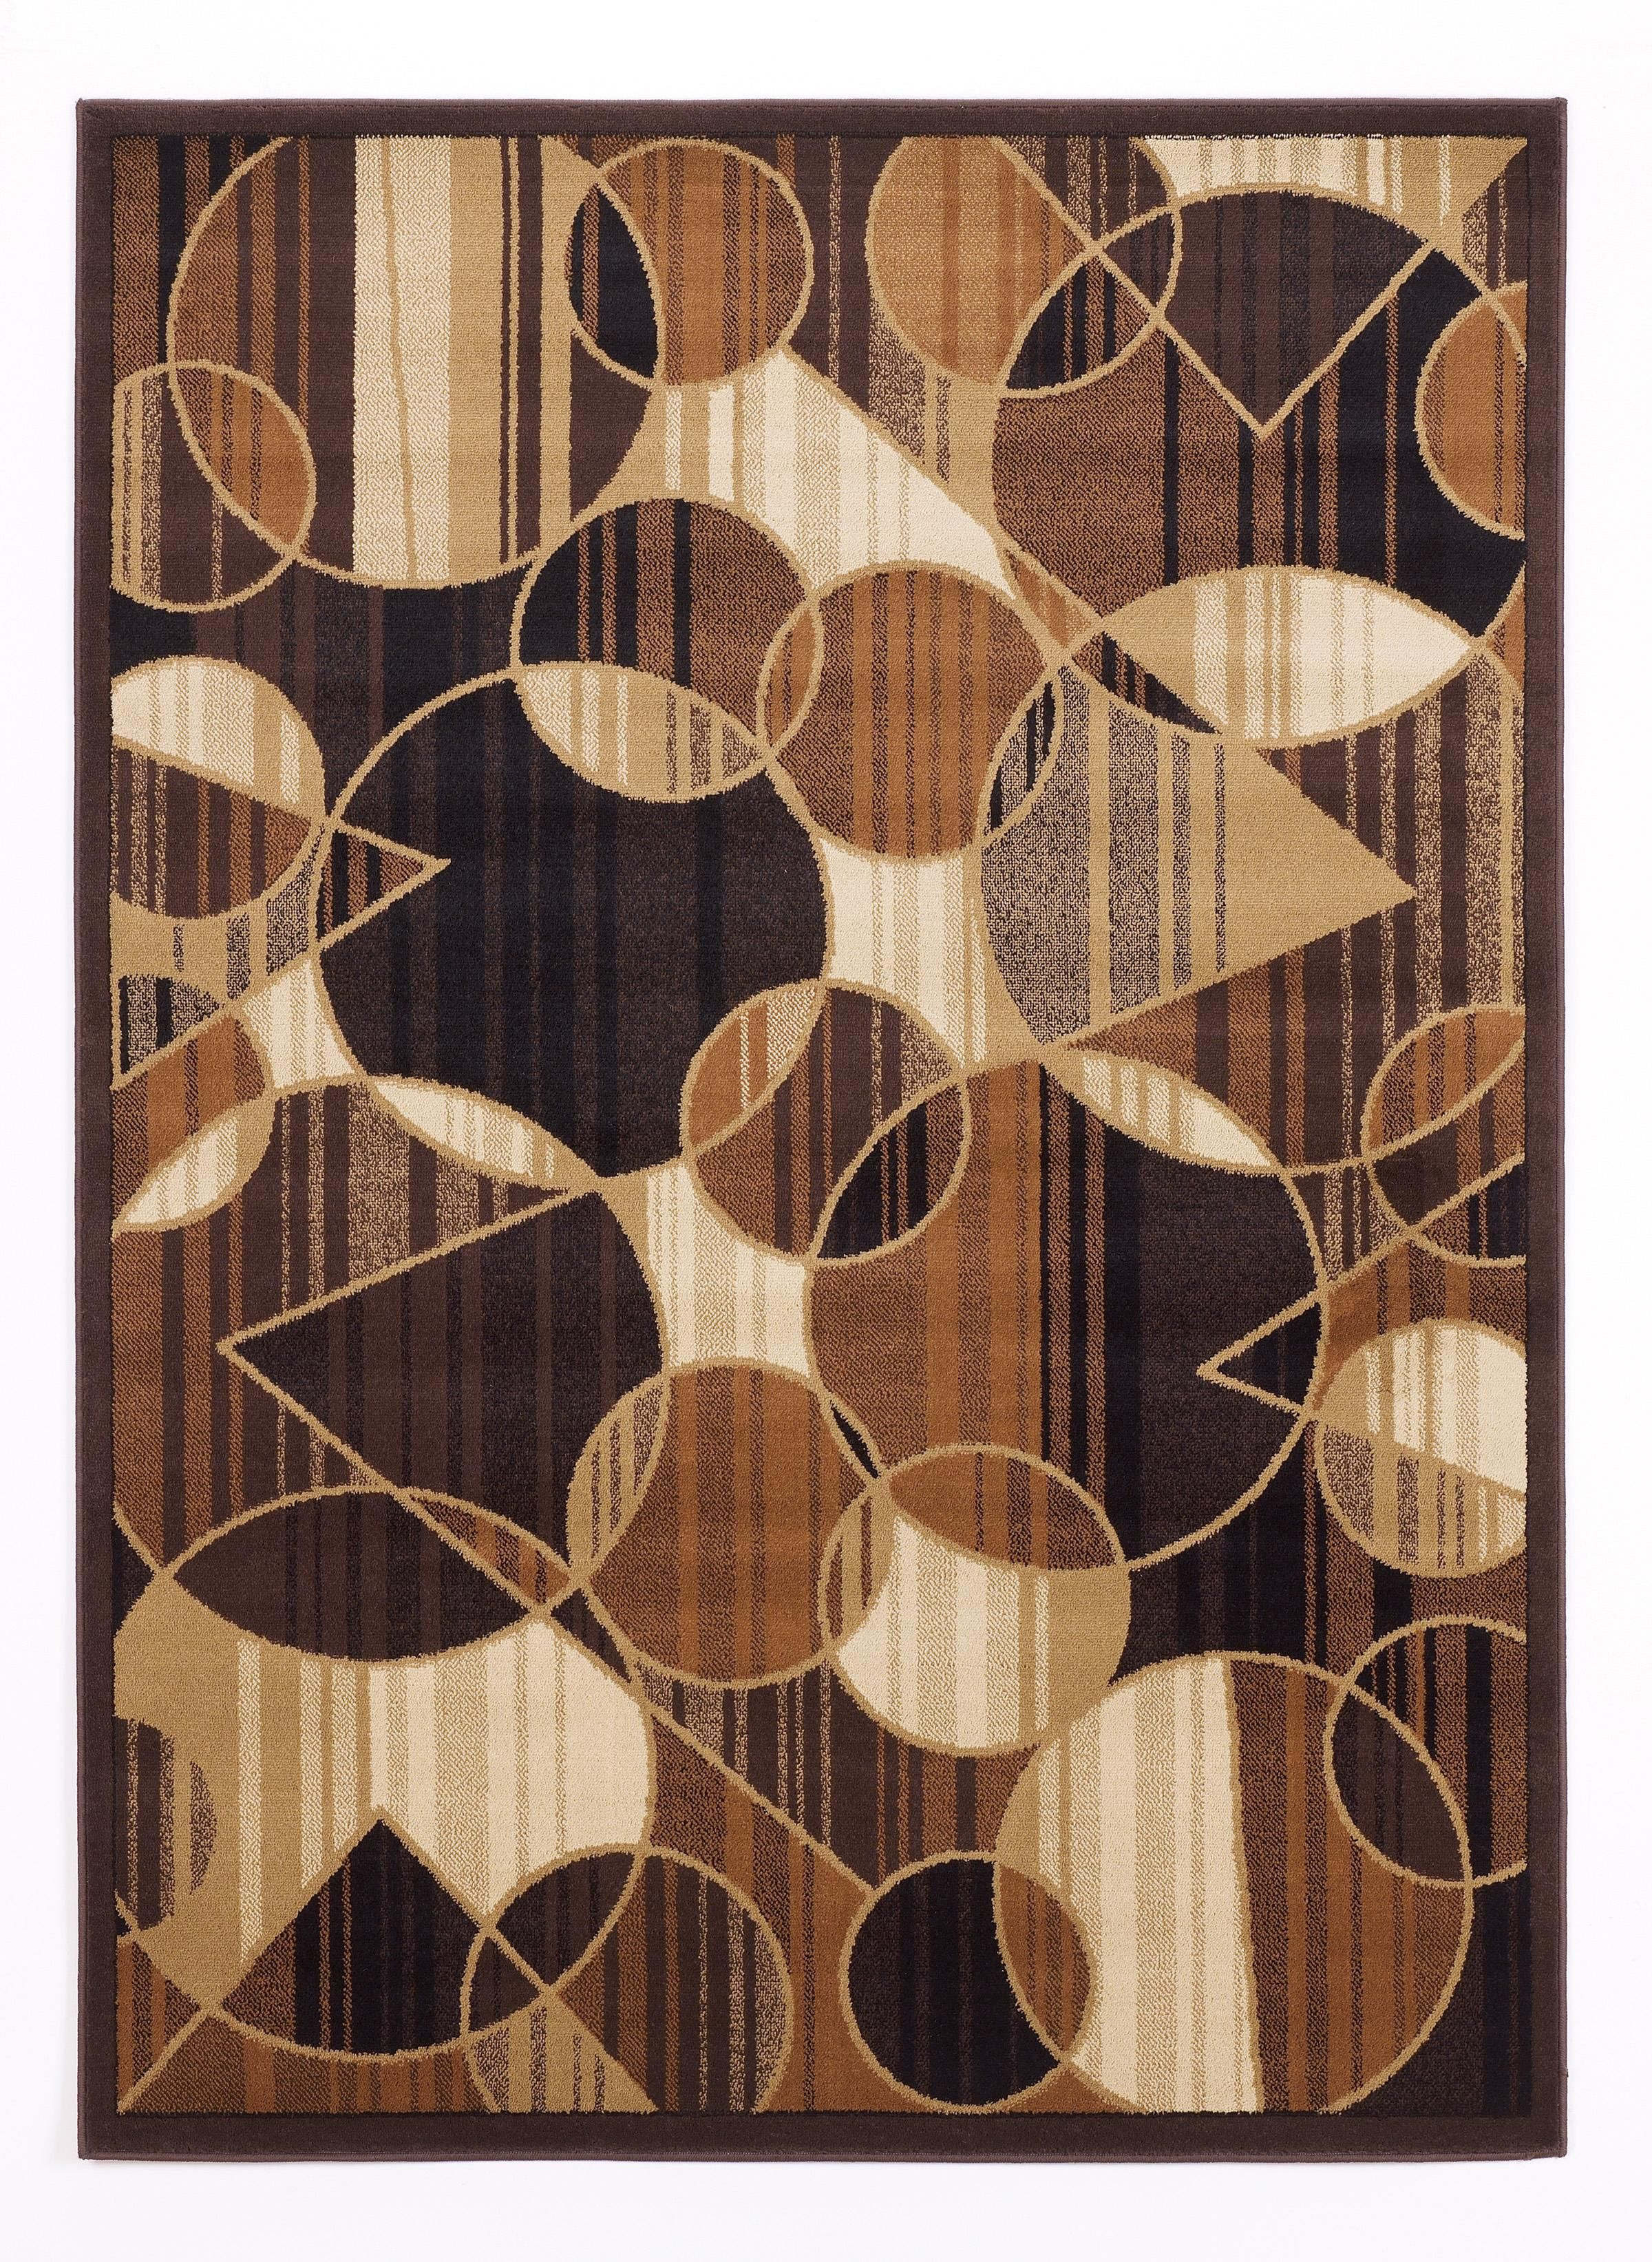 Contemporary Area Rugs Calder Multi Rug By Signature Design Ashley